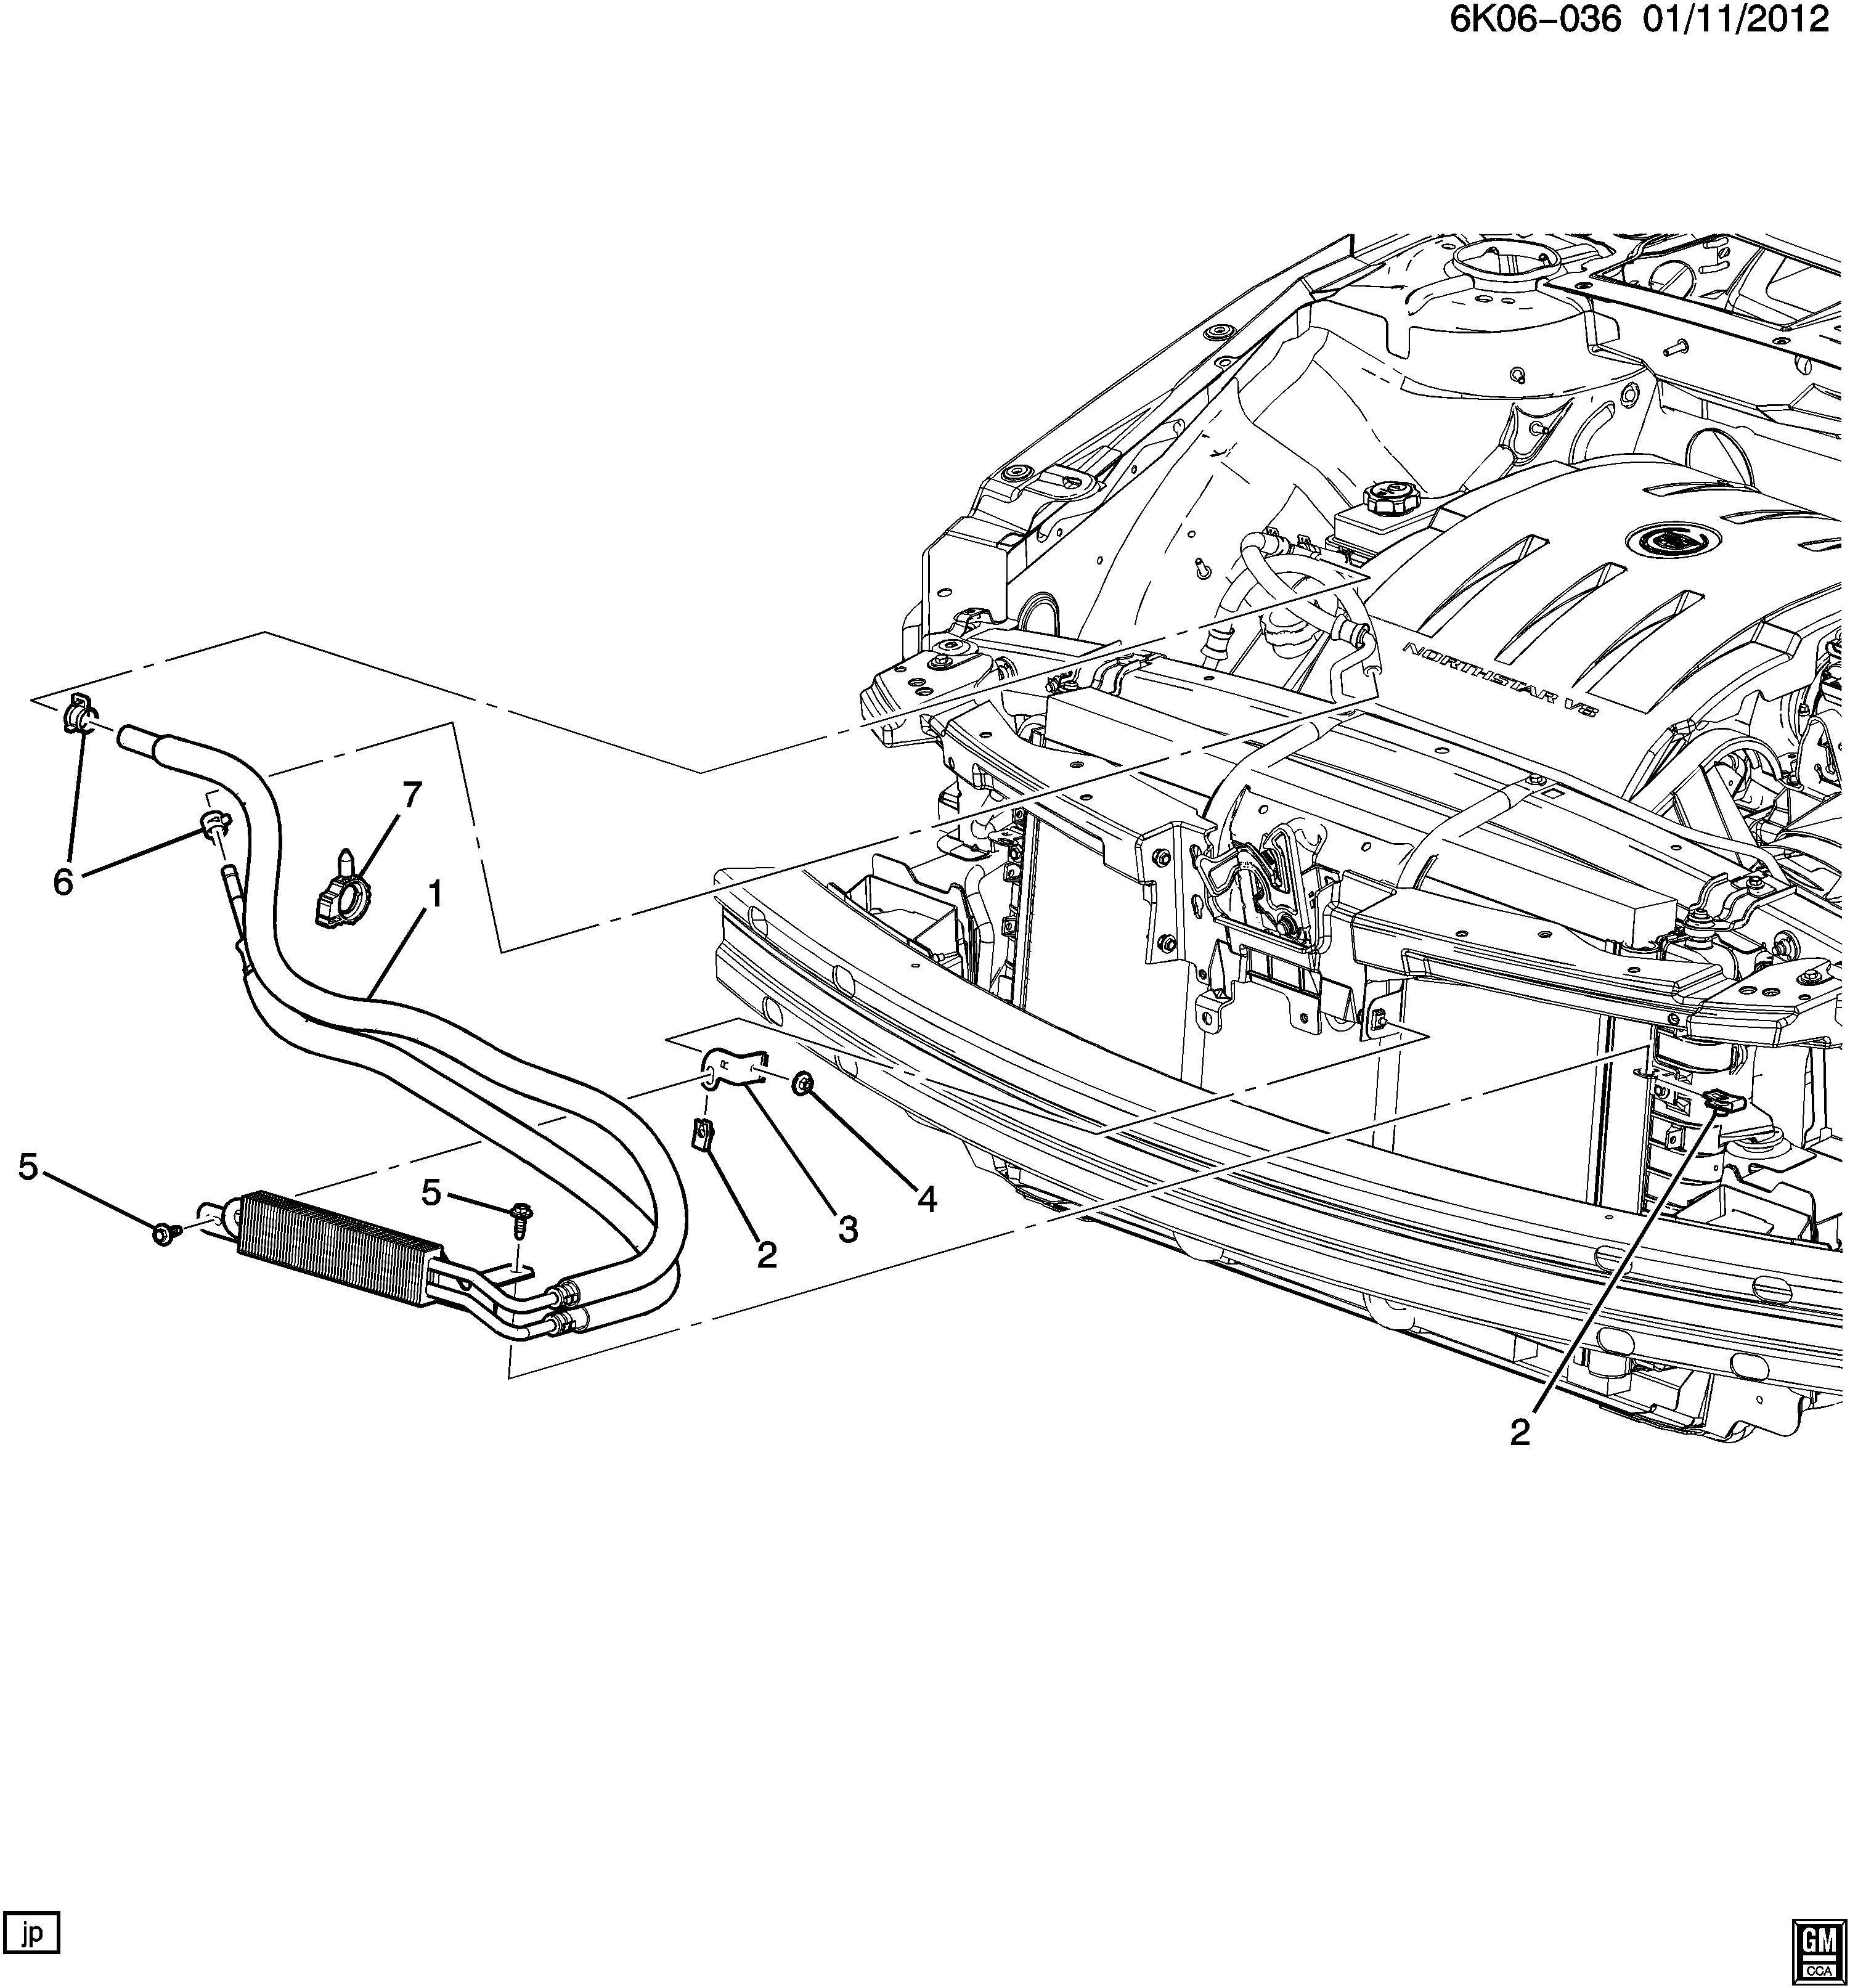 Cadillac DTS Cooler kit. Power steering fluid. Cooler kit